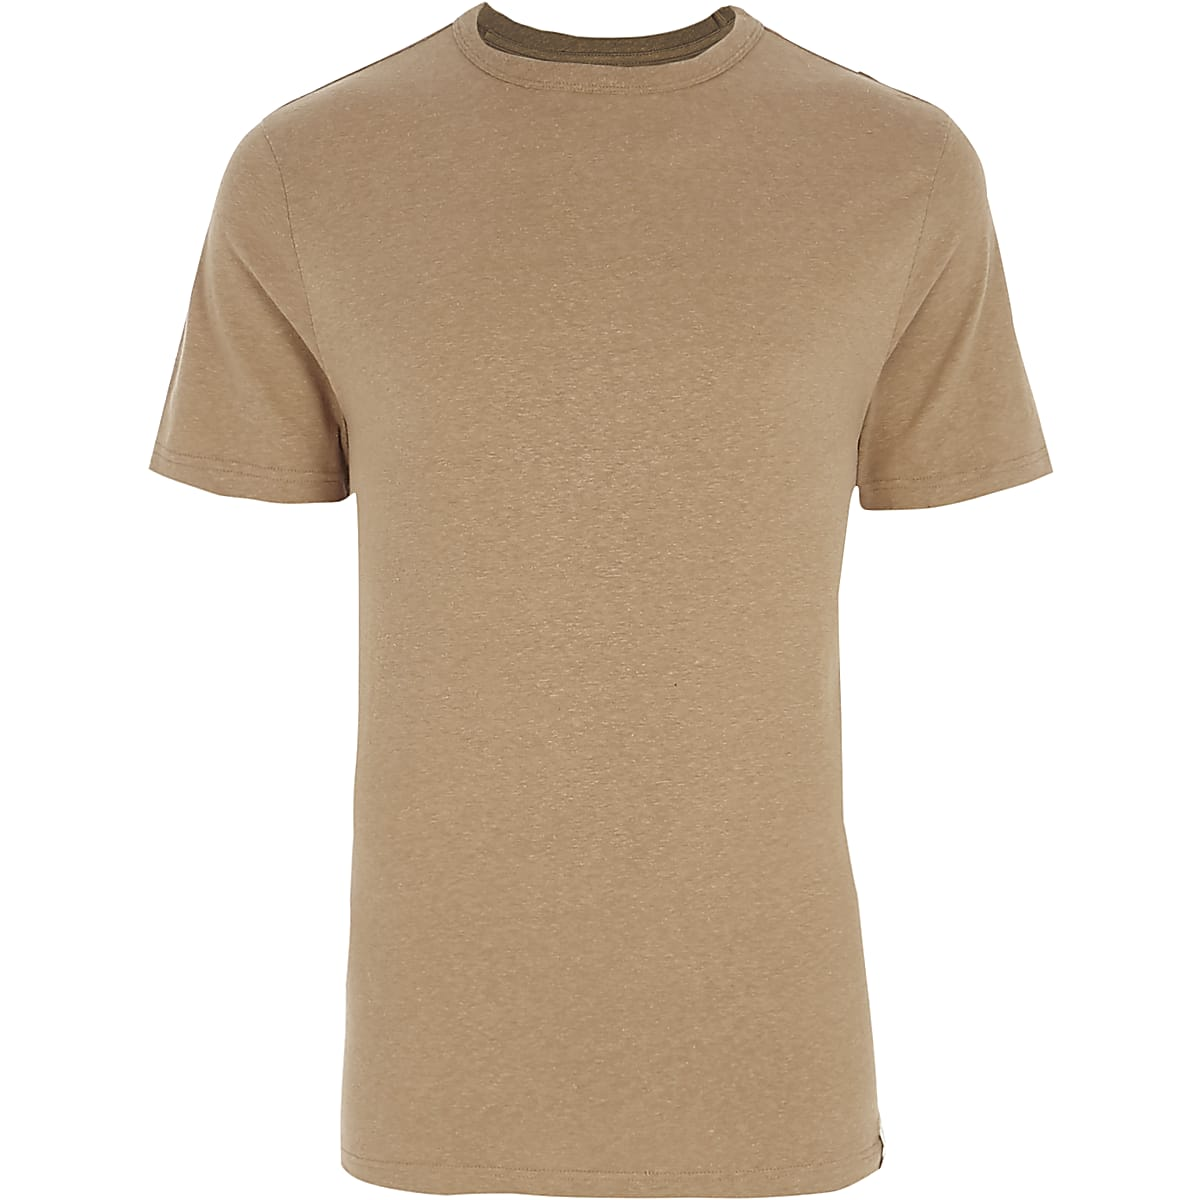 Camel slim fit crew neck T-shirt